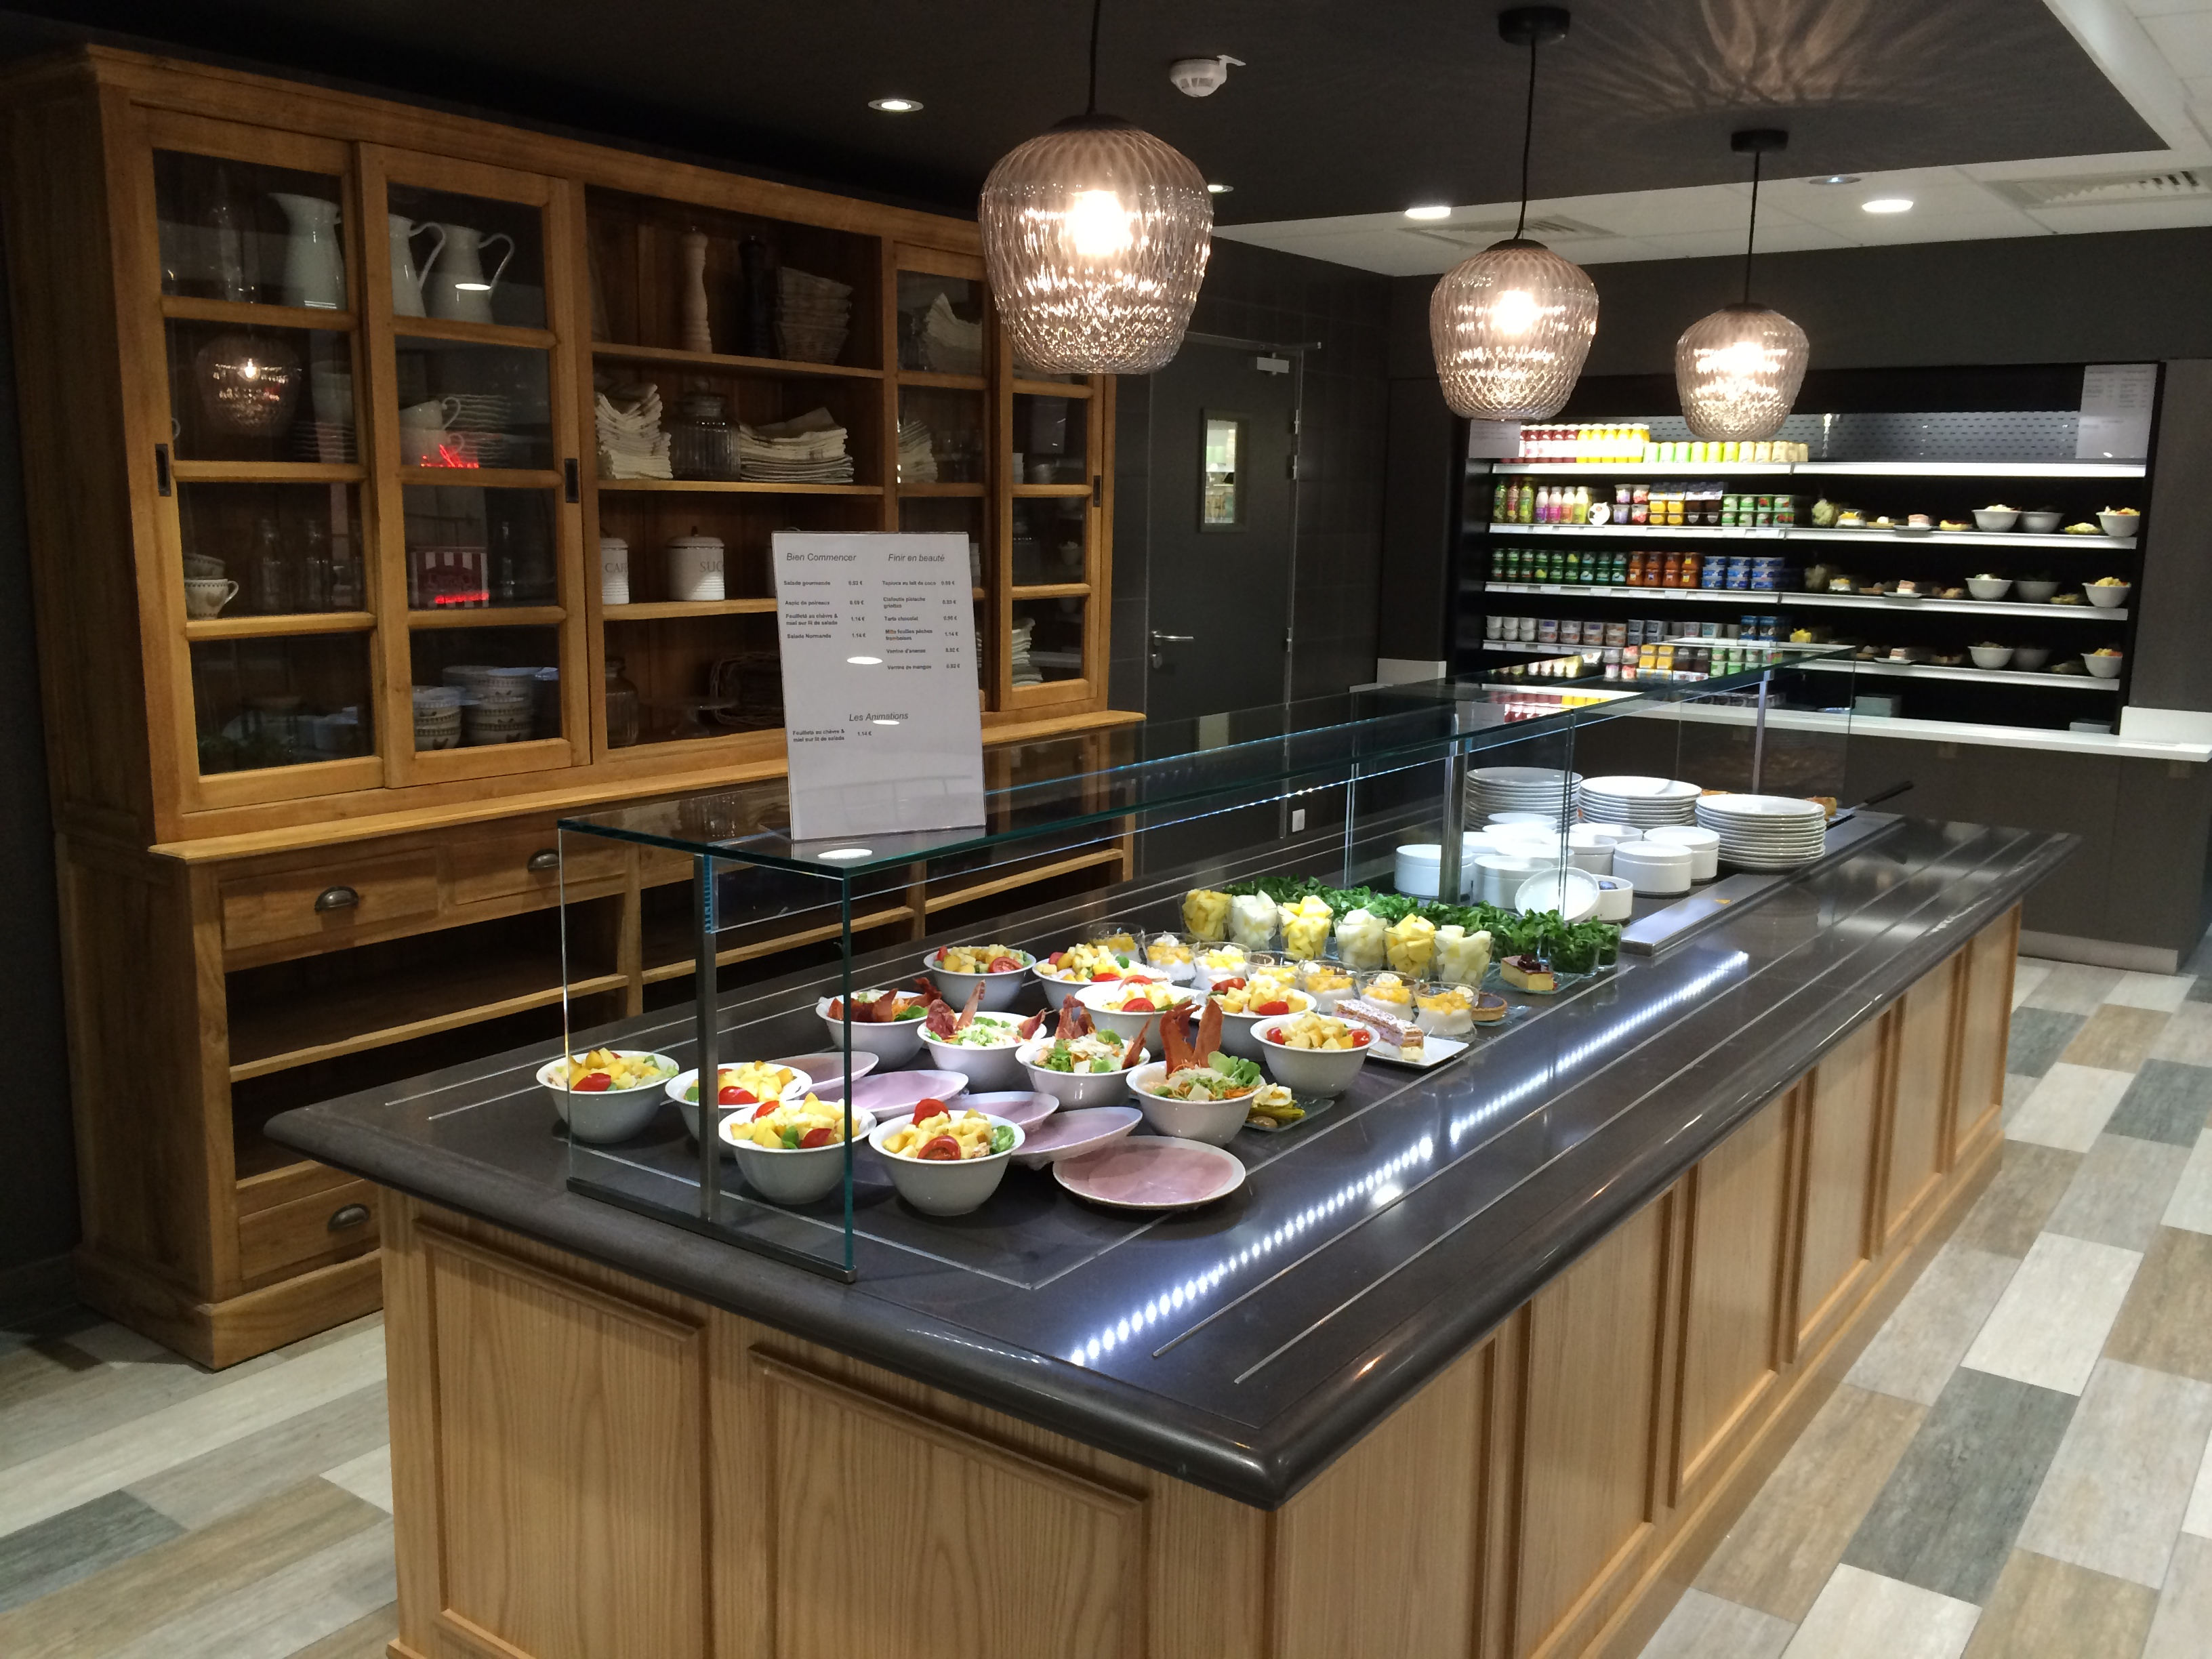 restaurant d'entreprise neuilly-sur-seine - hacs restauration - Cours De Cuisine Neuilly Sur Seine